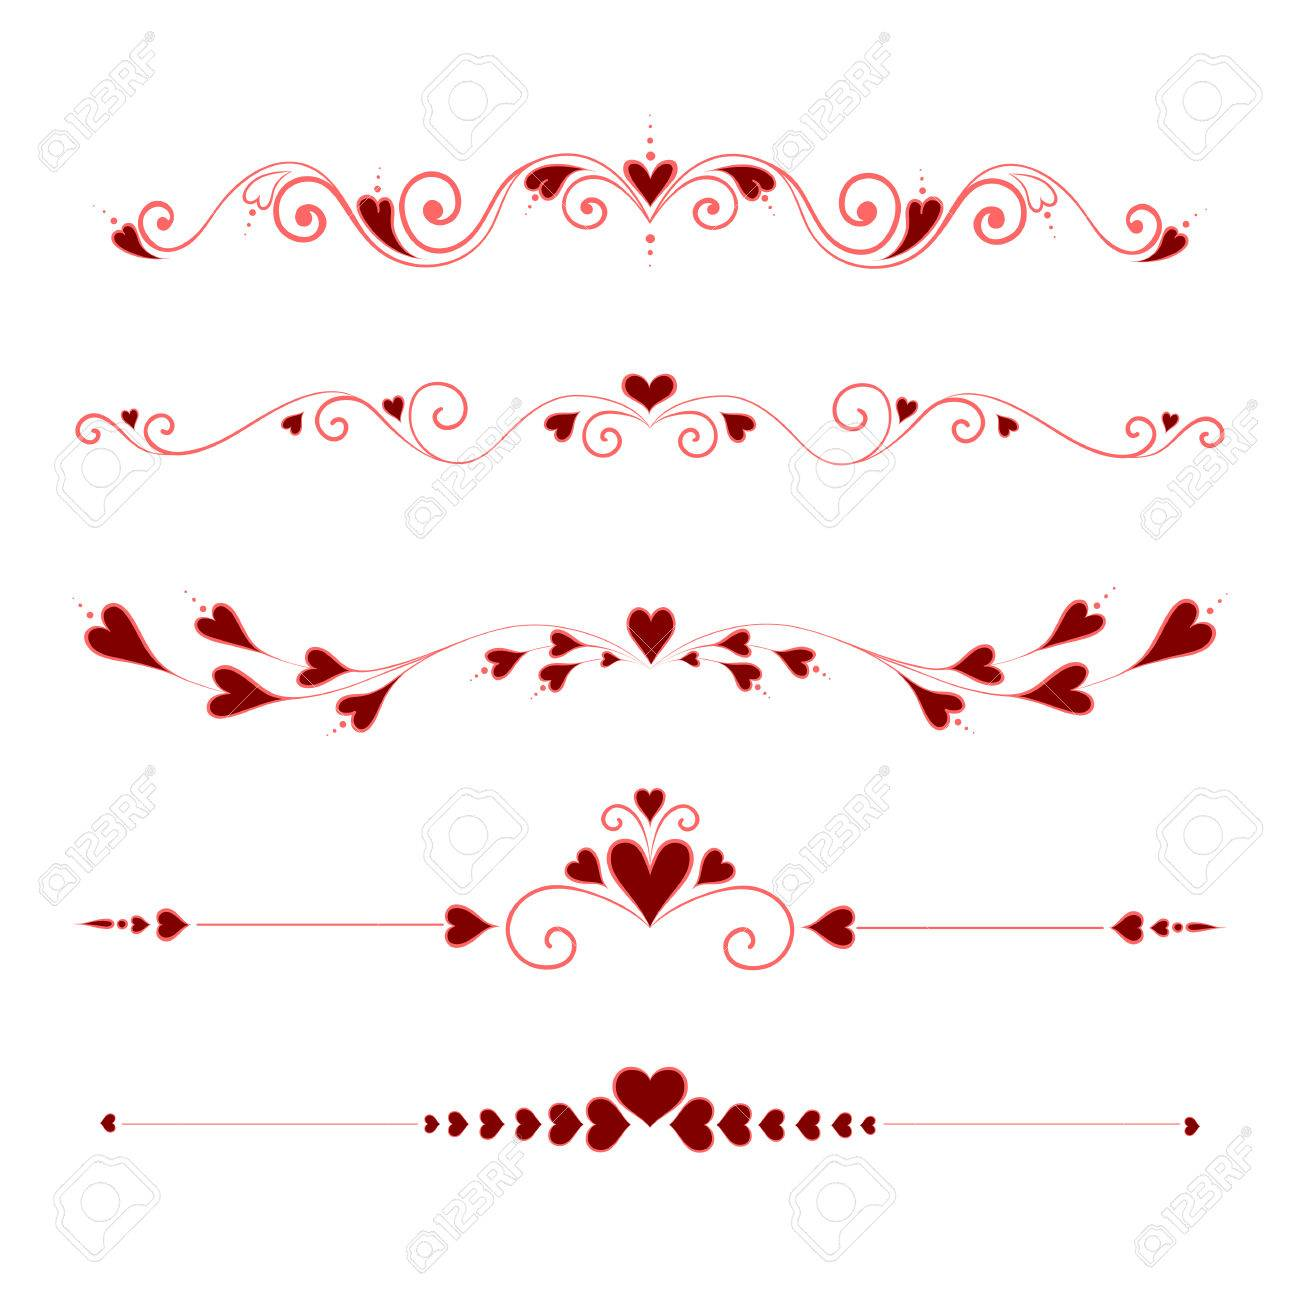 Set Calligraphic Valentine's Day Design Elements - 46940974